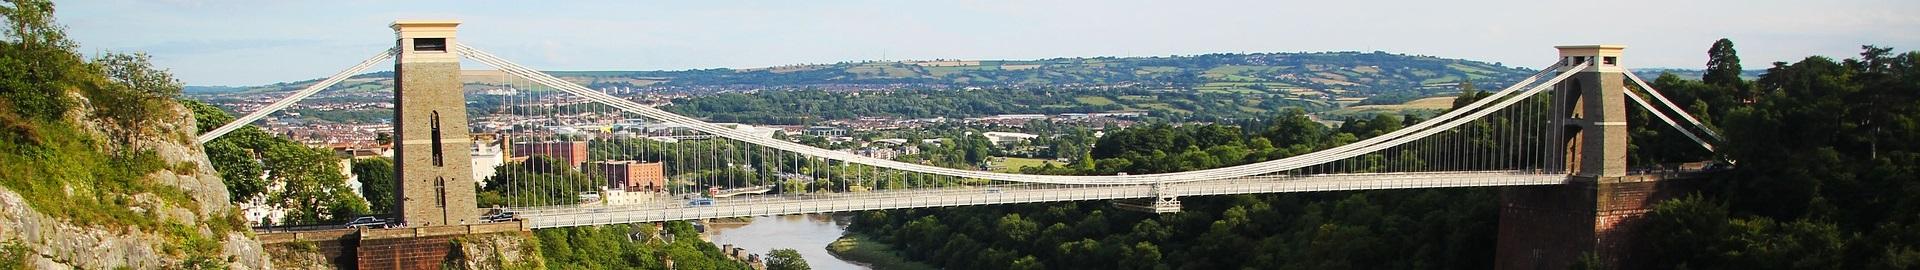 Header image. A photo of Bristol suspension bridge,